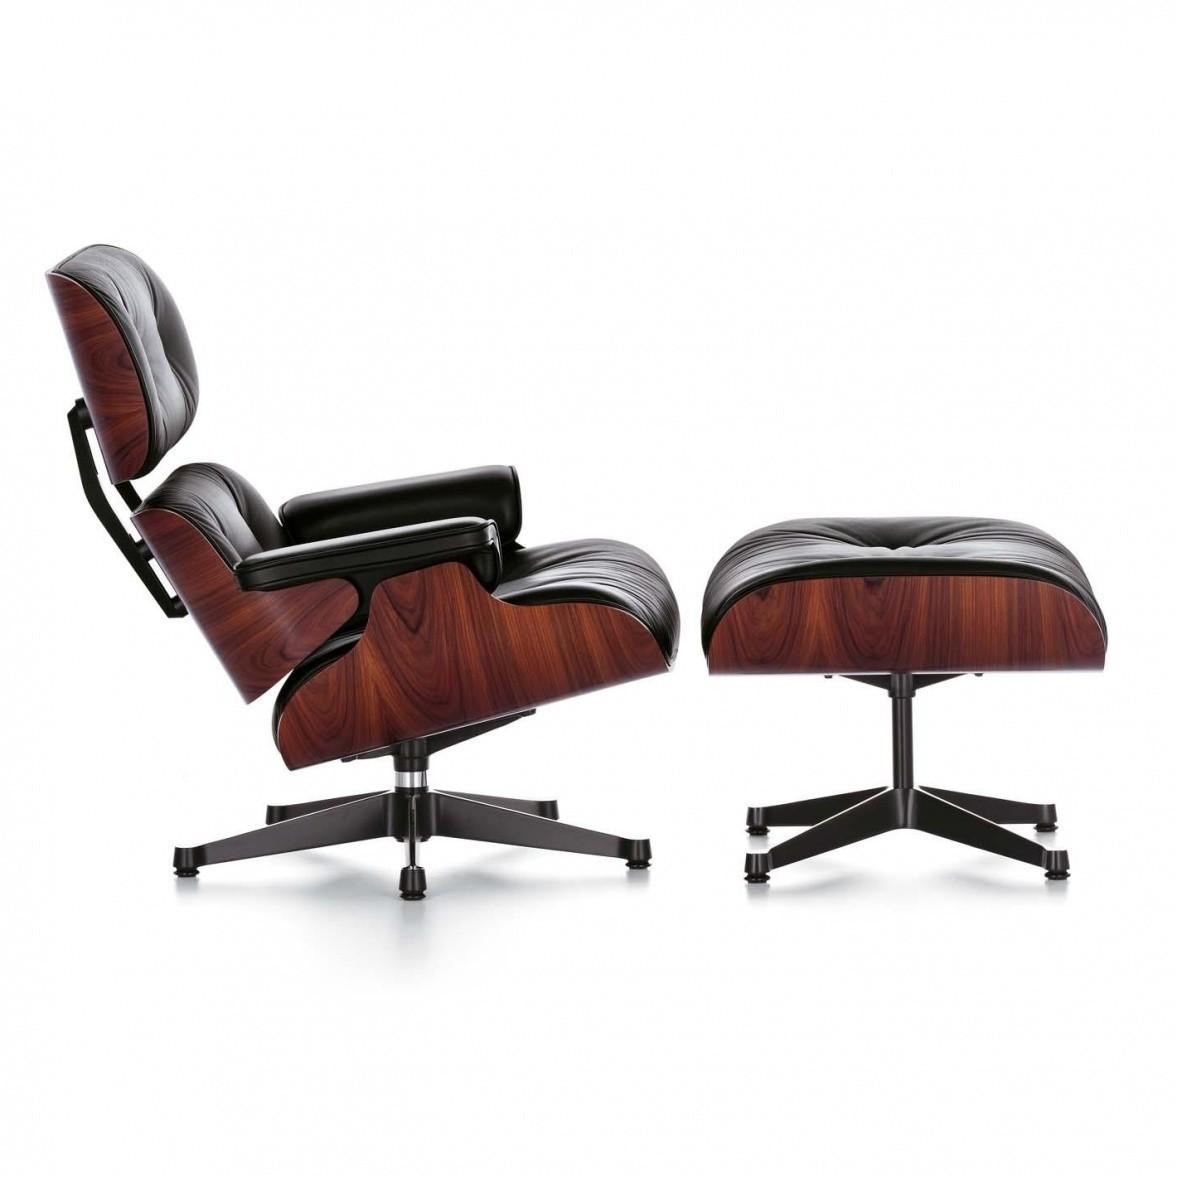 Vitra Eames Lounge Chair Ottoman